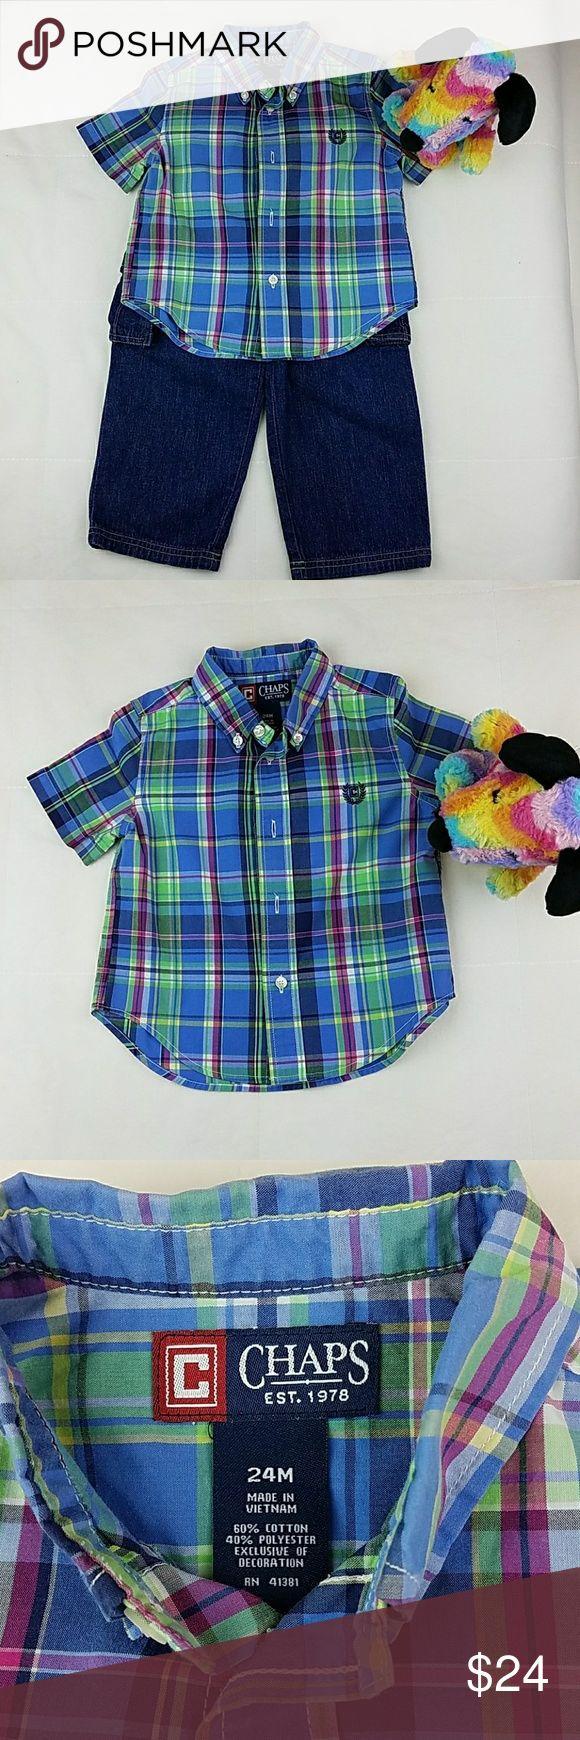 Set Plaid Chaps Shirt & Pants Set Chaps plaid shirt  Blue, green, red  Size: 24m   Garanimals cargo blue jeans  Size: 24m   Both in excellent condition. Chaps Shirts & Tops Button Down Shirts